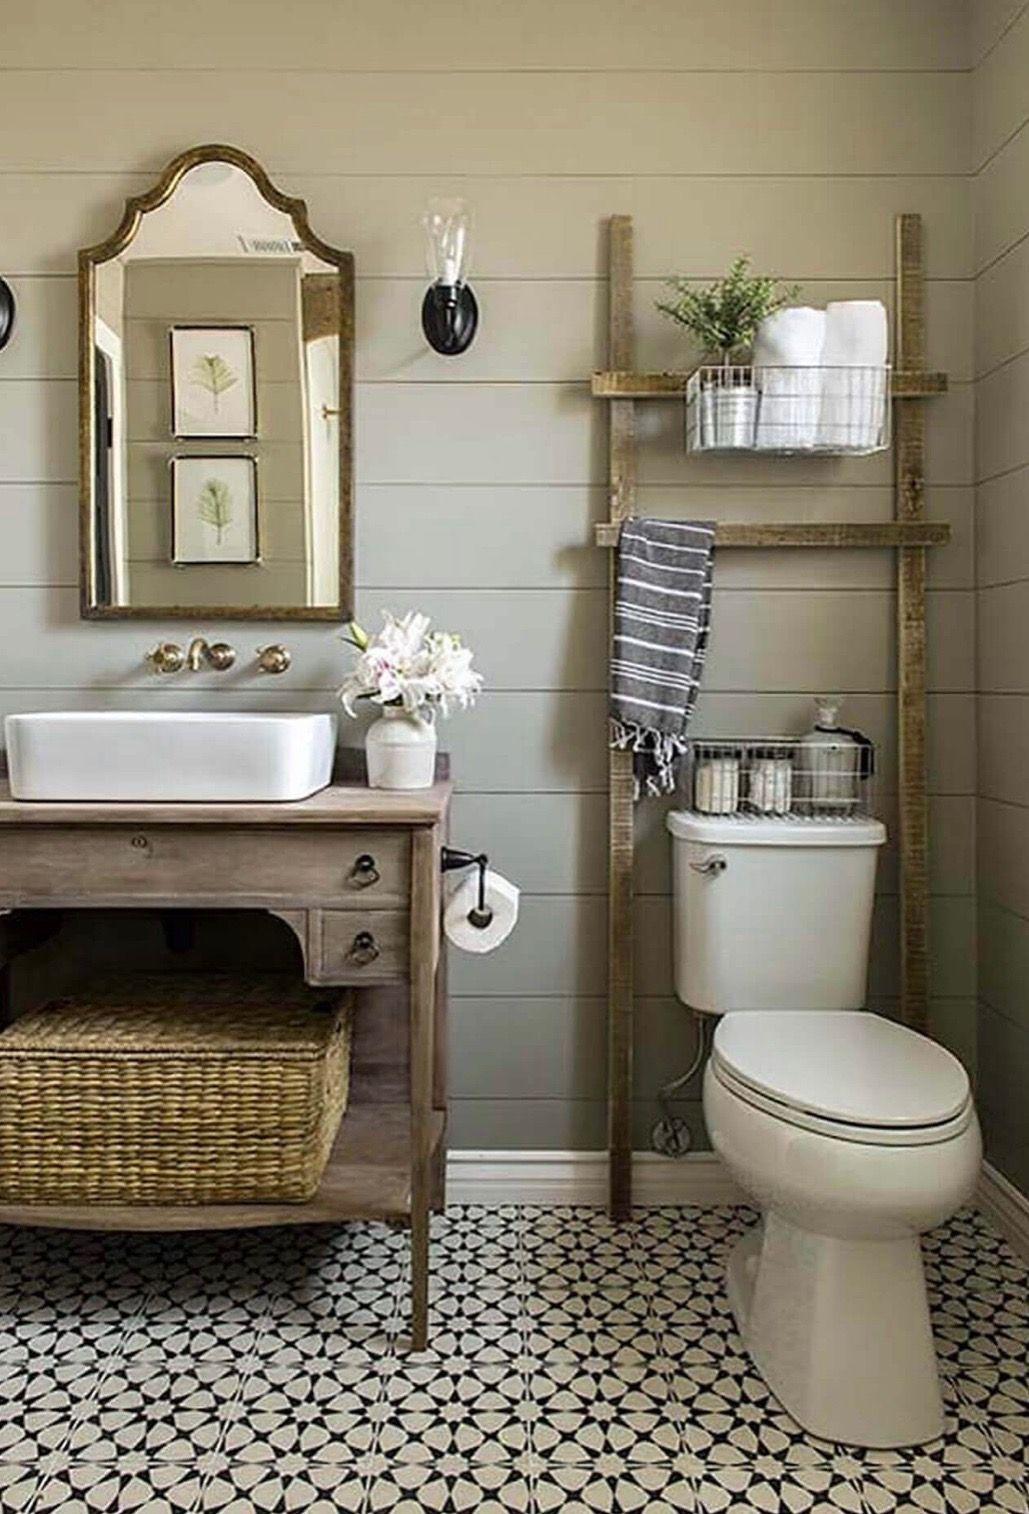 Pin by Cecilie Starin on Bathroom | Bathroom design ...